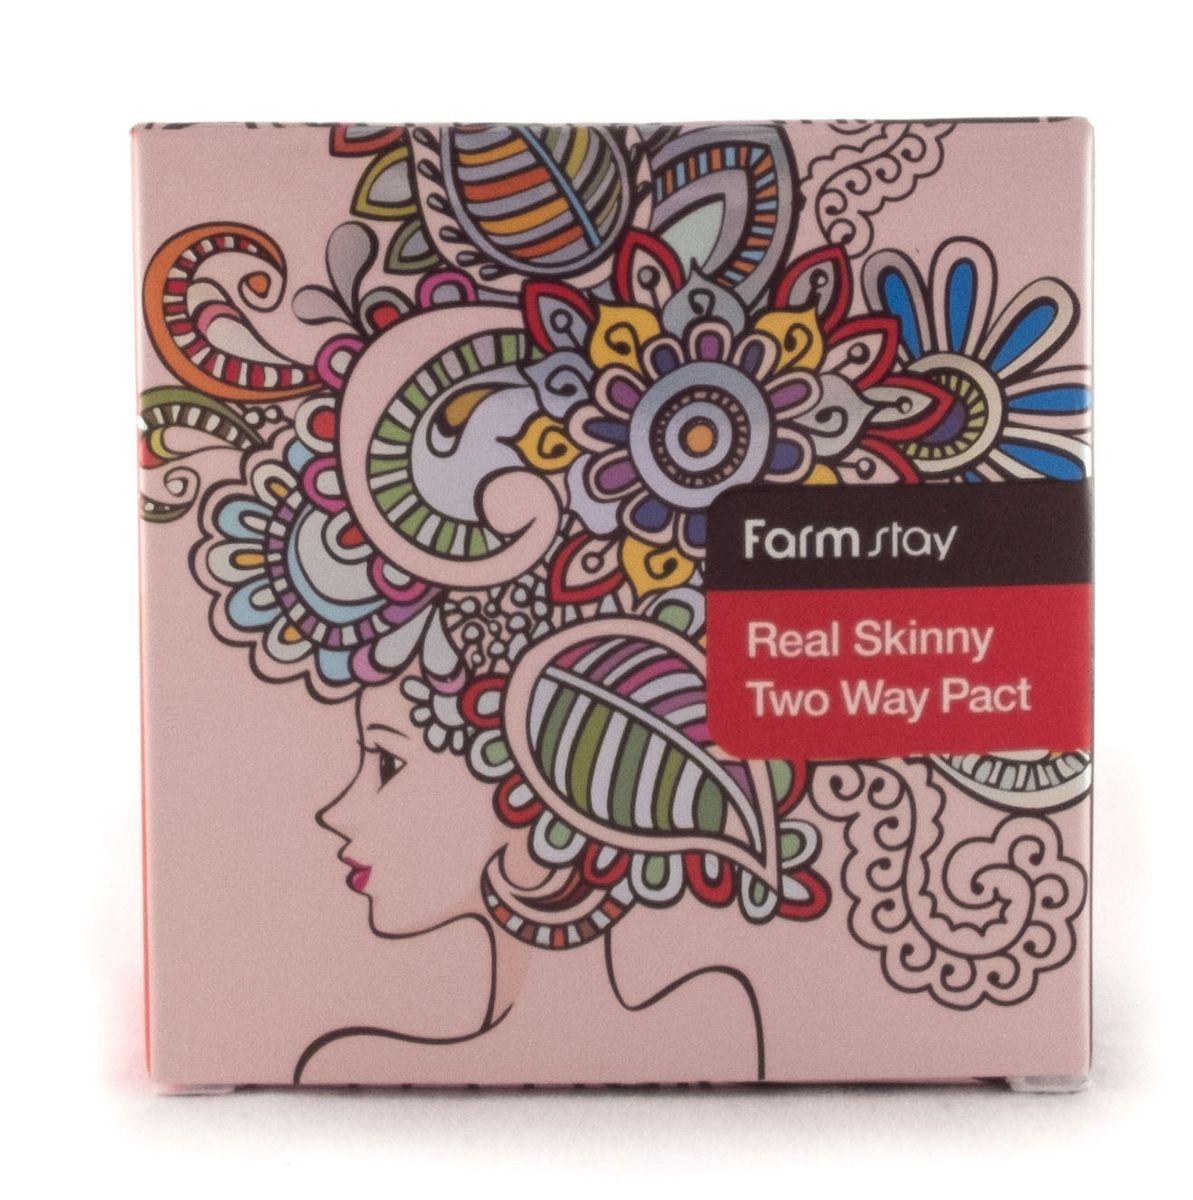 FarmStay Компактная крем-пудра для лица, тон №21 Светлый Беж, со сменным блоком, 13 г + 13 г